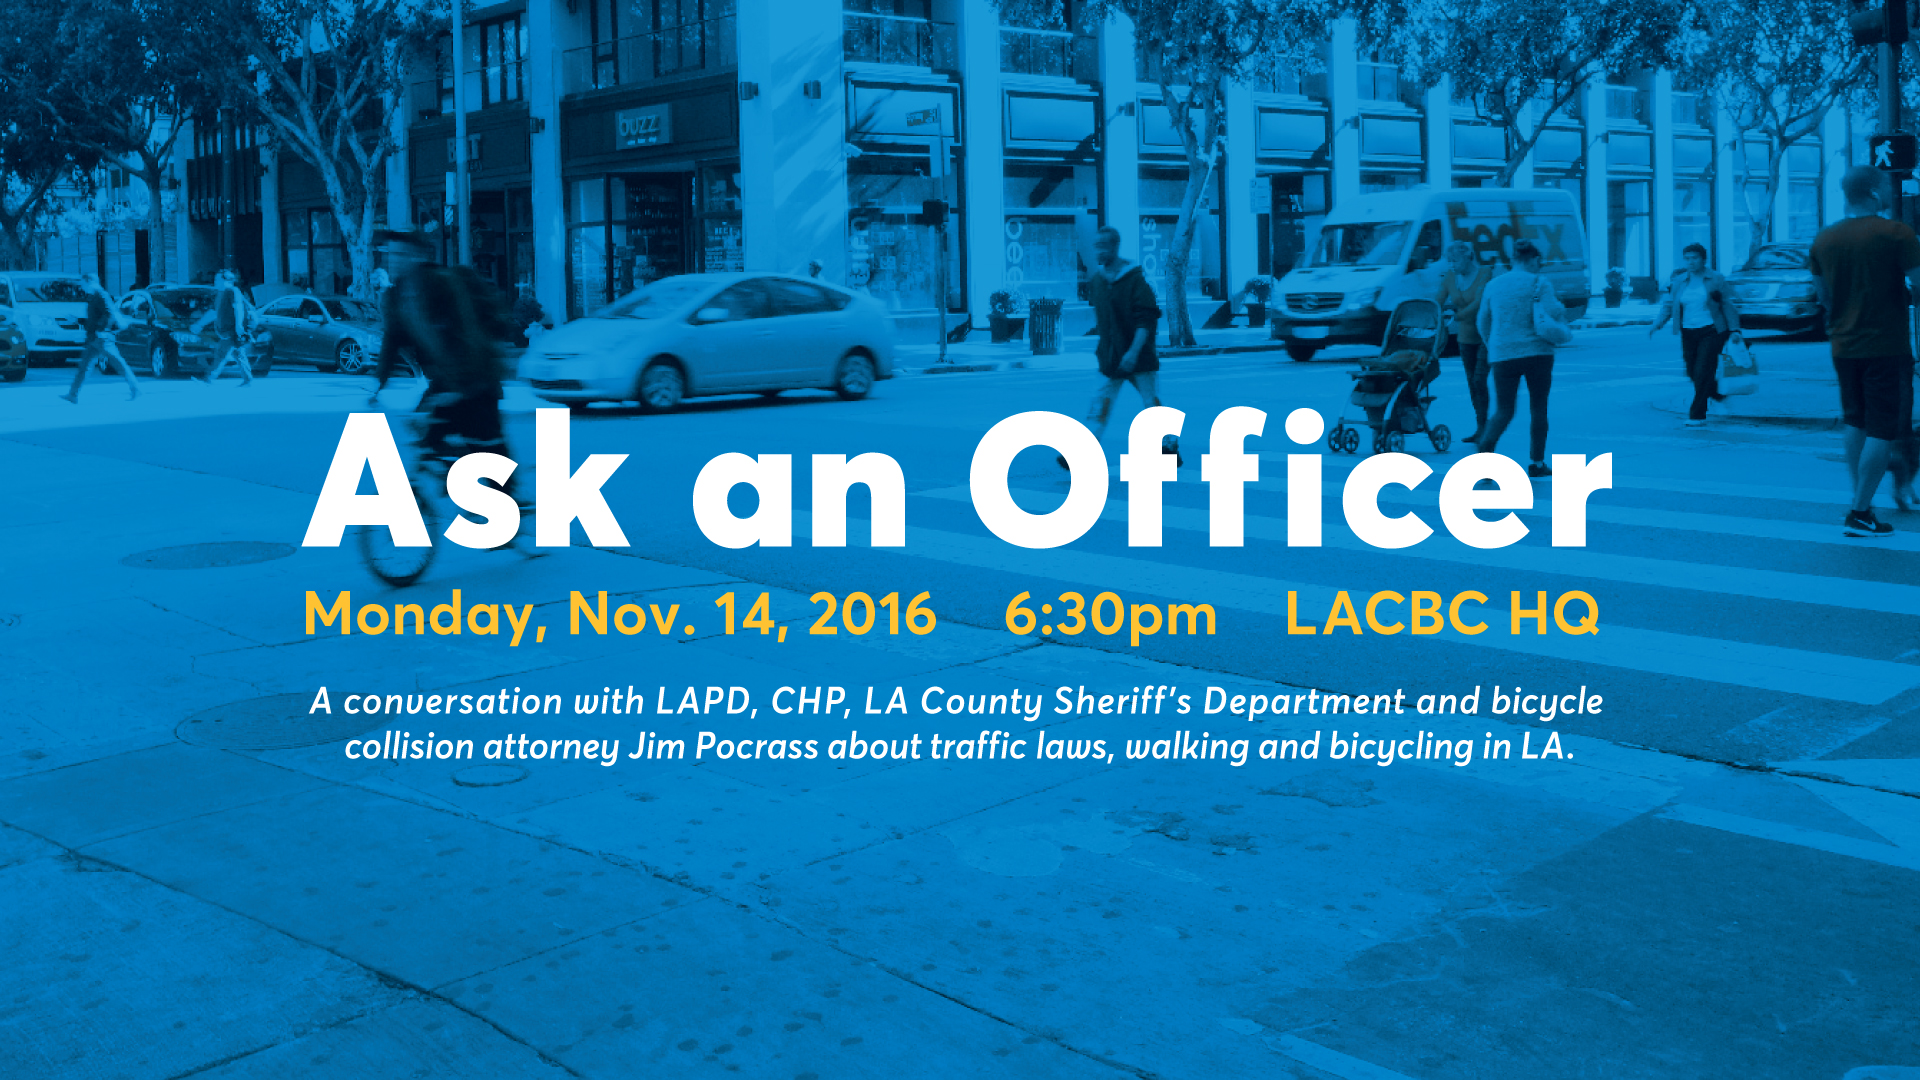 ask_an_officer_fb_header_F_sheriff.jpg